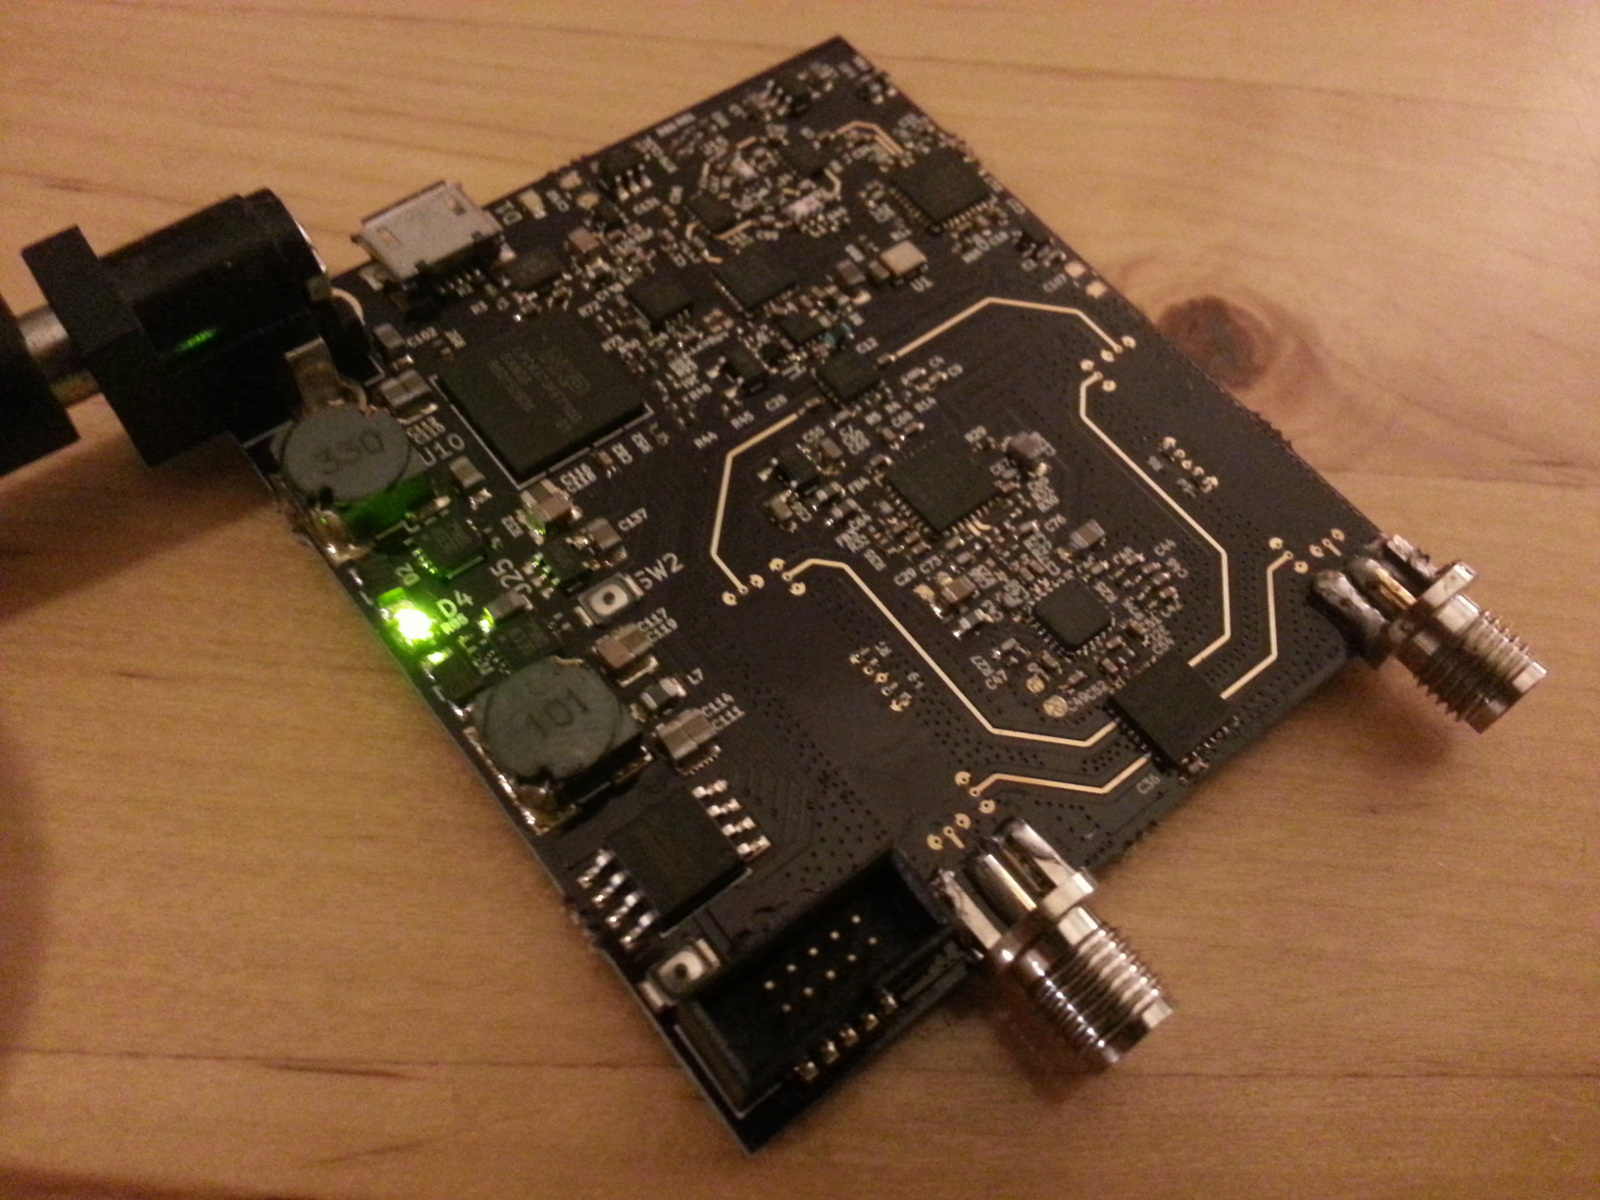 Cheap homemade 30 MHz - 6 GHz vector network analyzer - Henrik's Blog